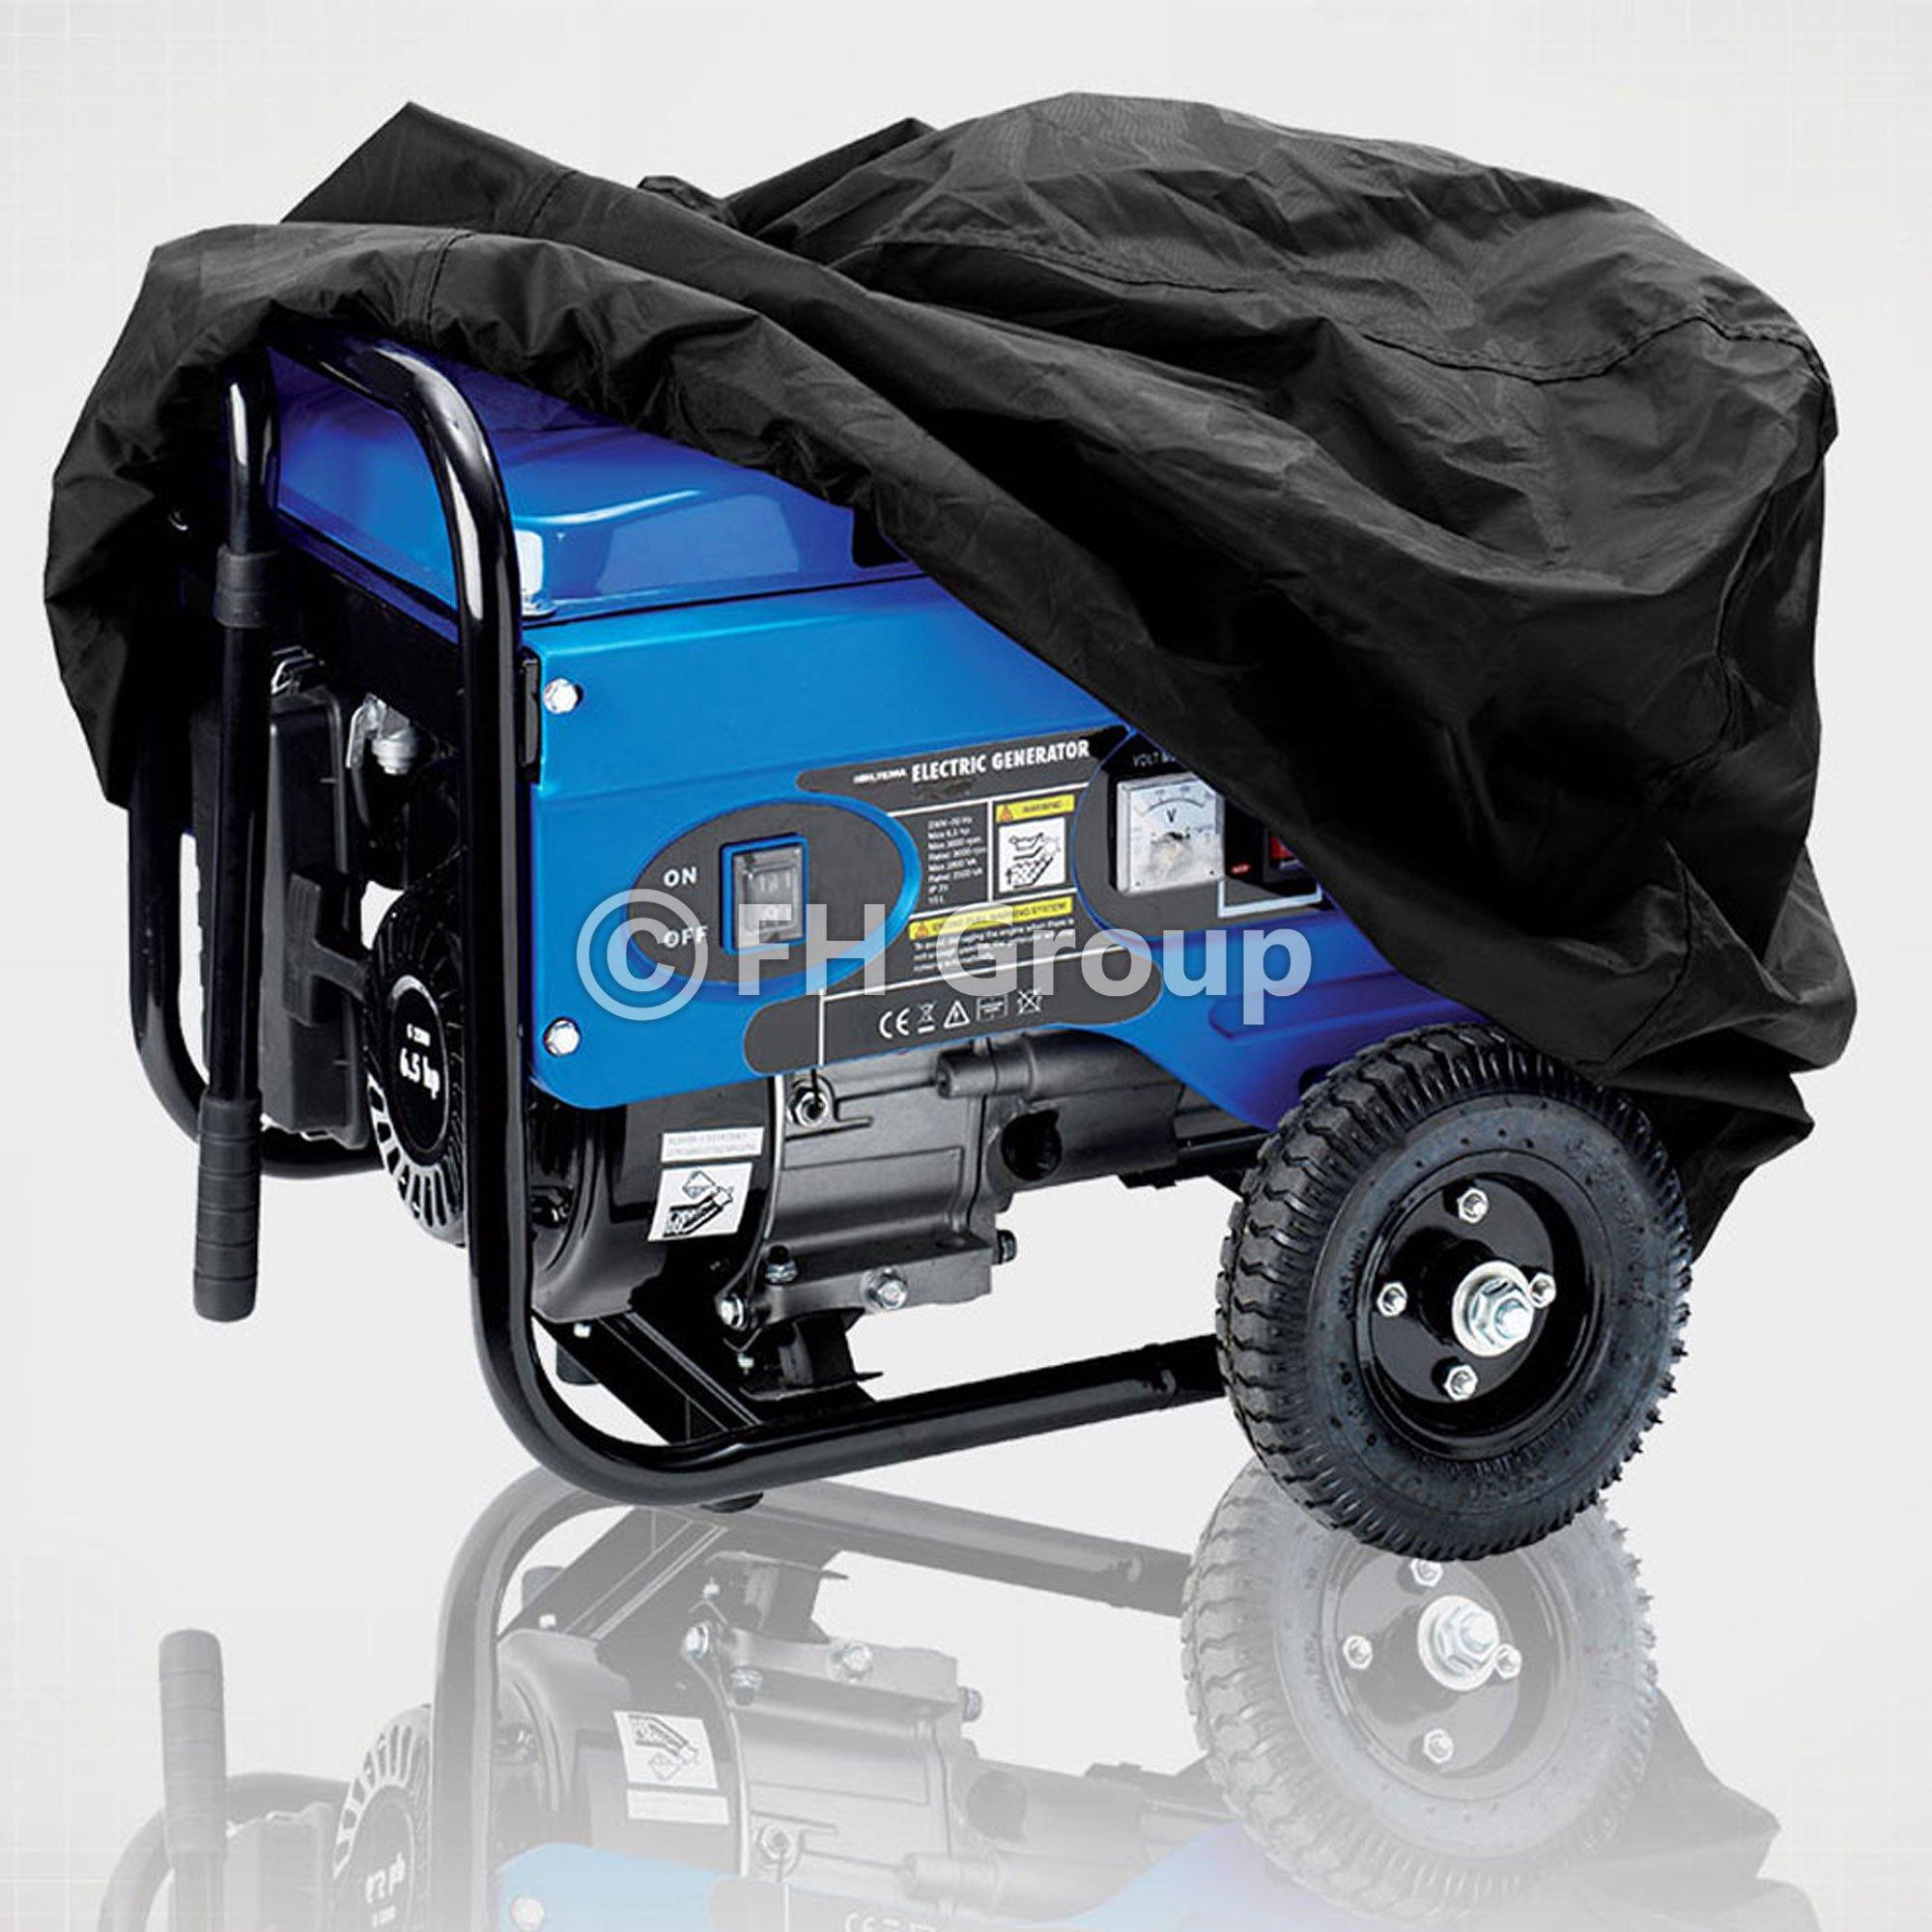 FH GROUP FH-EC707BLACK-XL FH GROUP Universal Weatherproof Heavy Duty Generator Cover, Black Color XL 37'' x 25'' x 27.5''